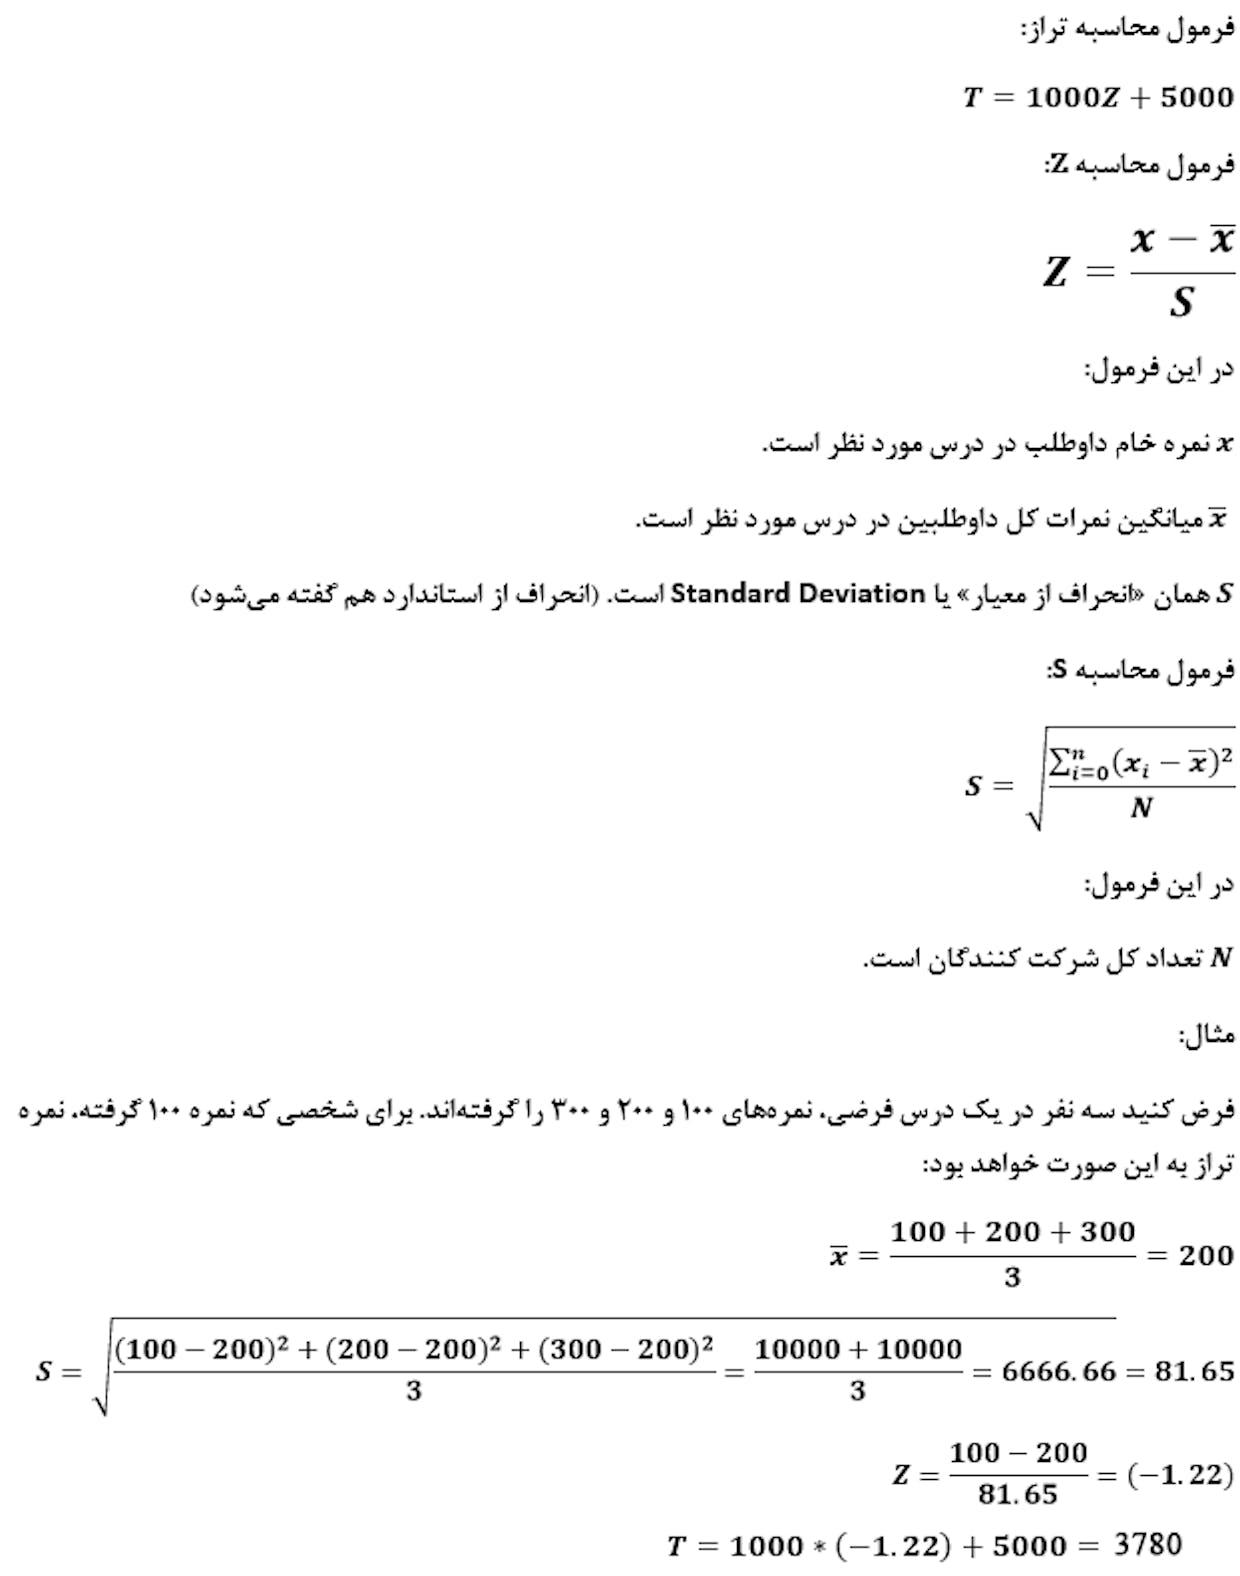 http://img.aftab.cc/news/92/balance.png